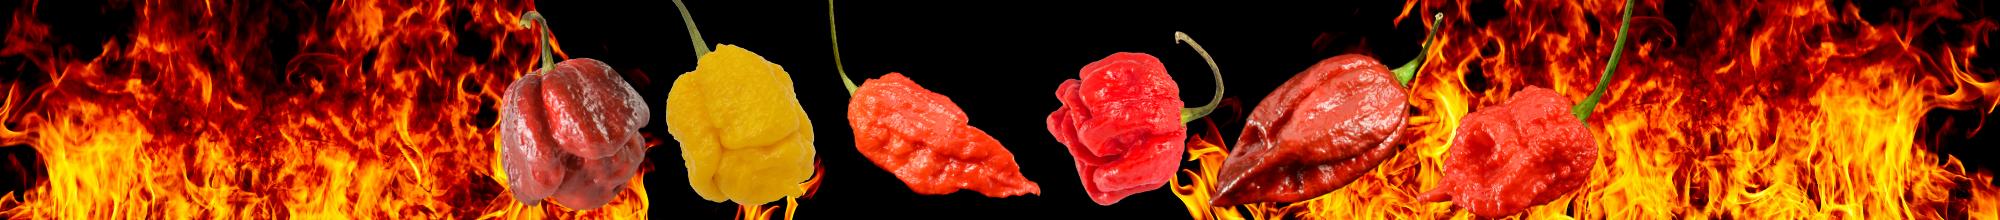 Super Hot Chillies